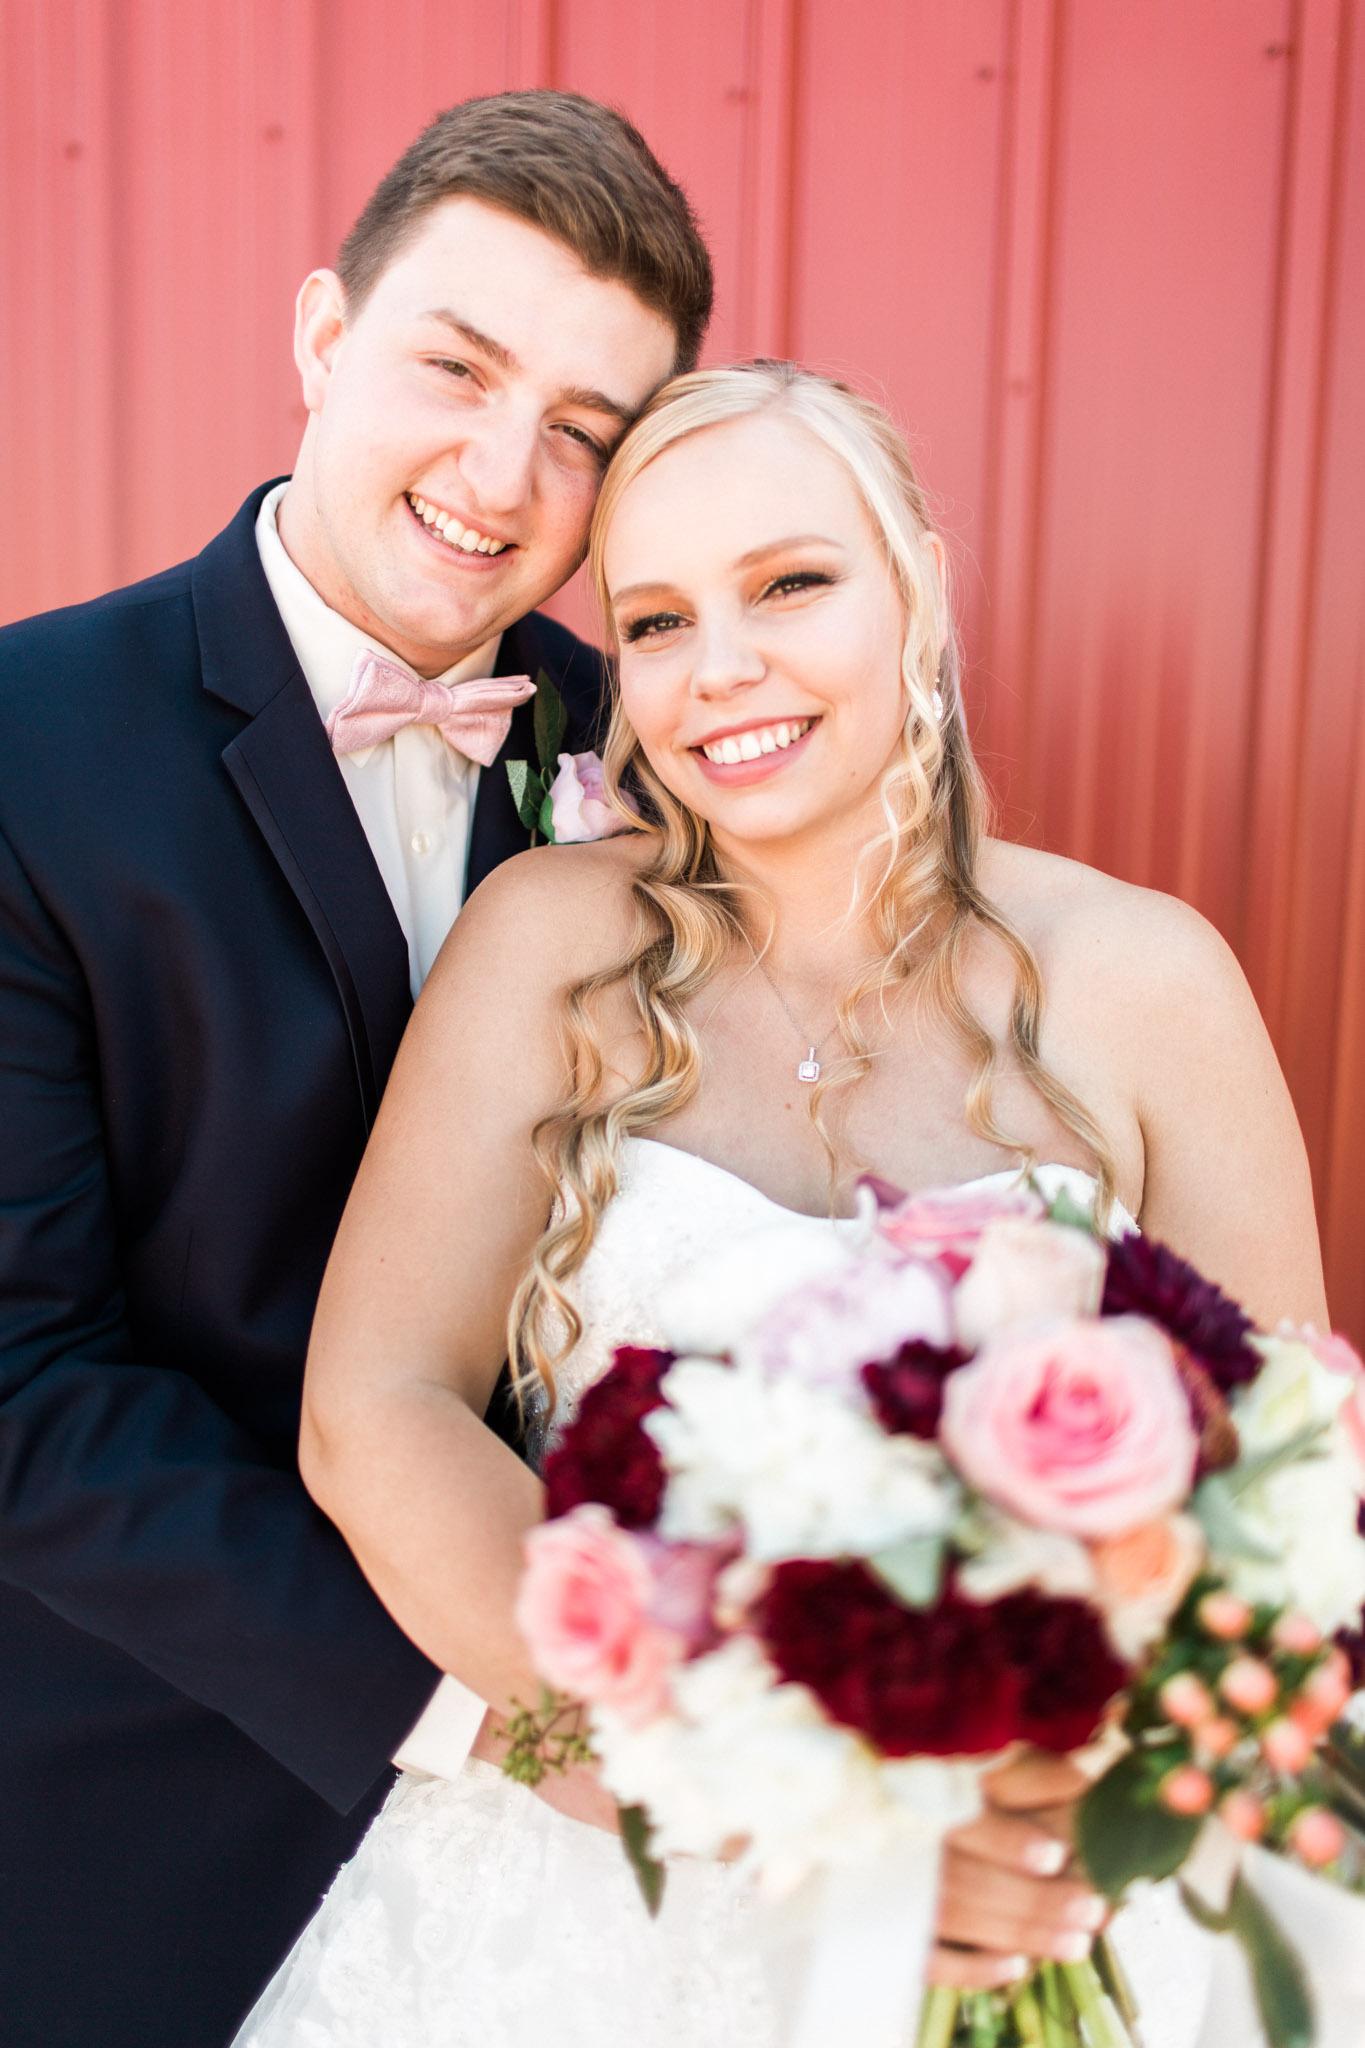 Wichita Falls, TX French Country Meadow Wedding Photos - Bridal Photography